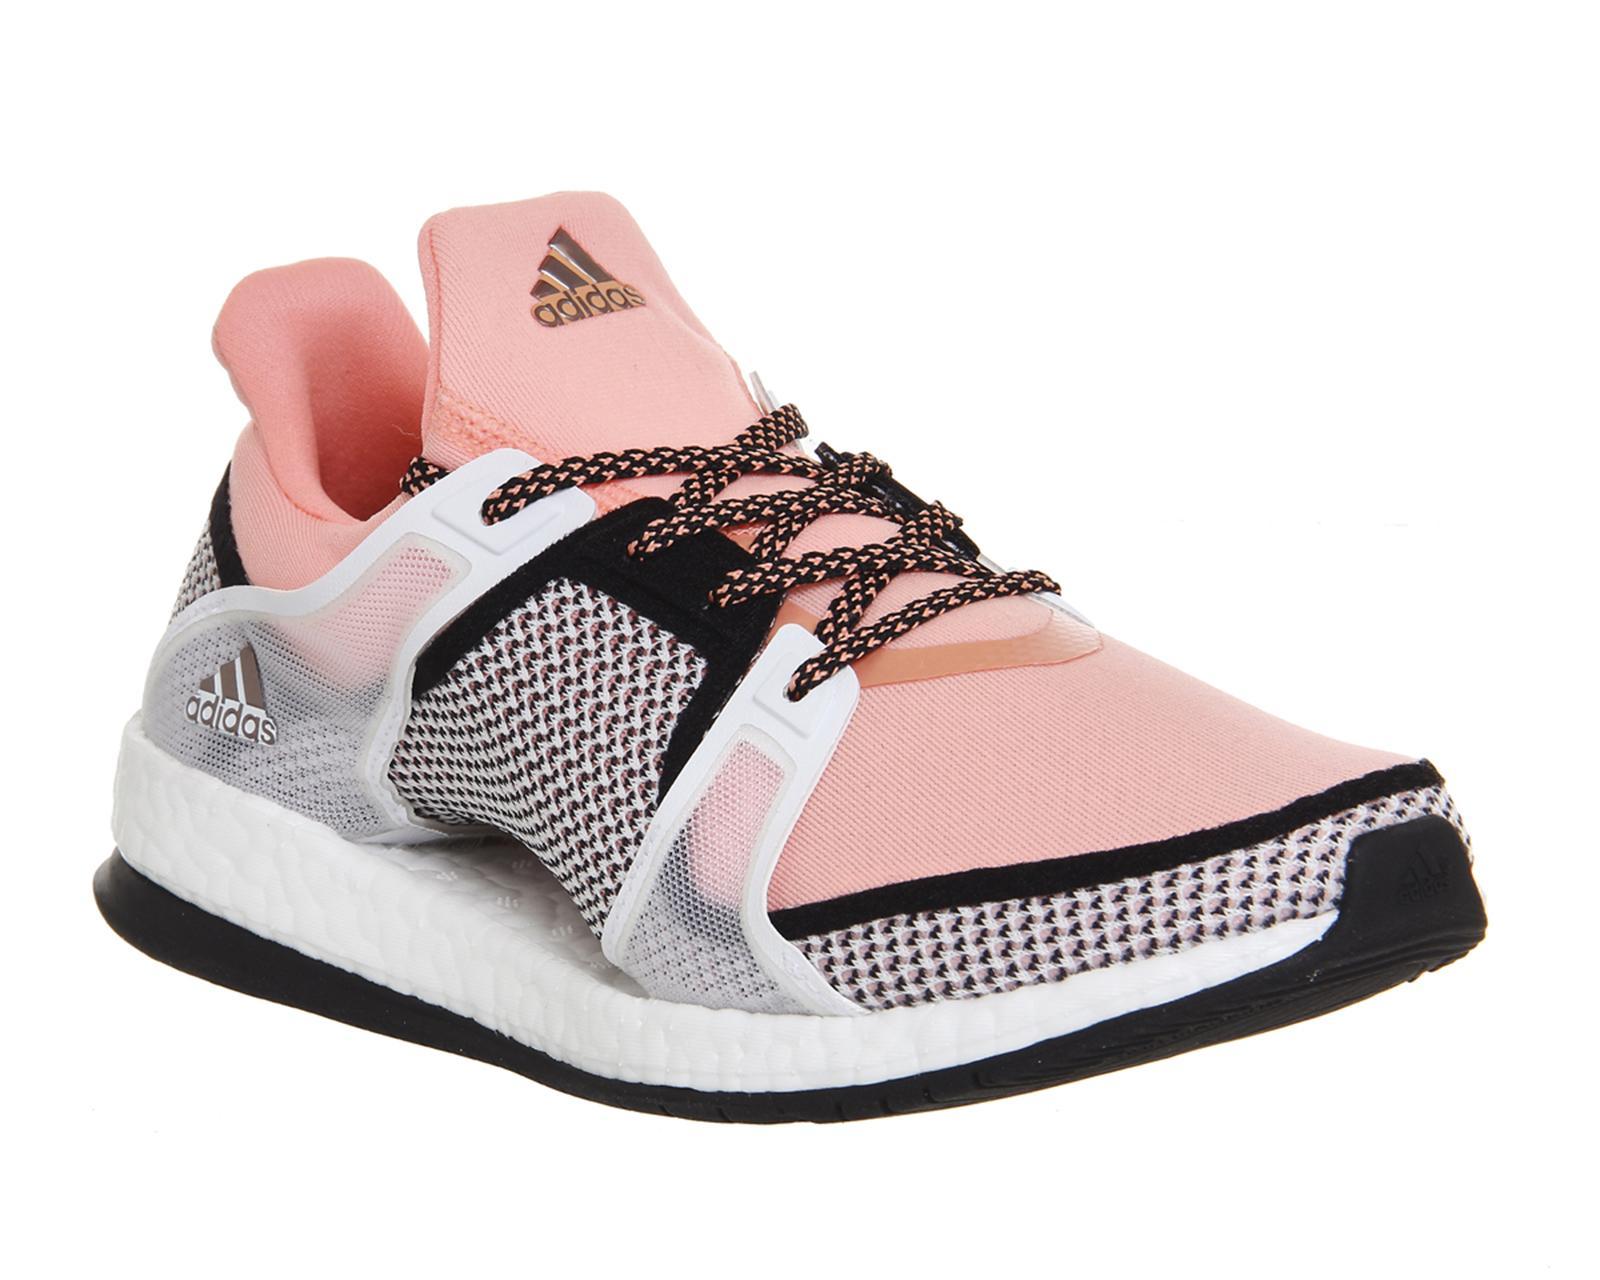 d54142f351e86 Lyst - adidas Originals Pure Boost X Tr in Pink